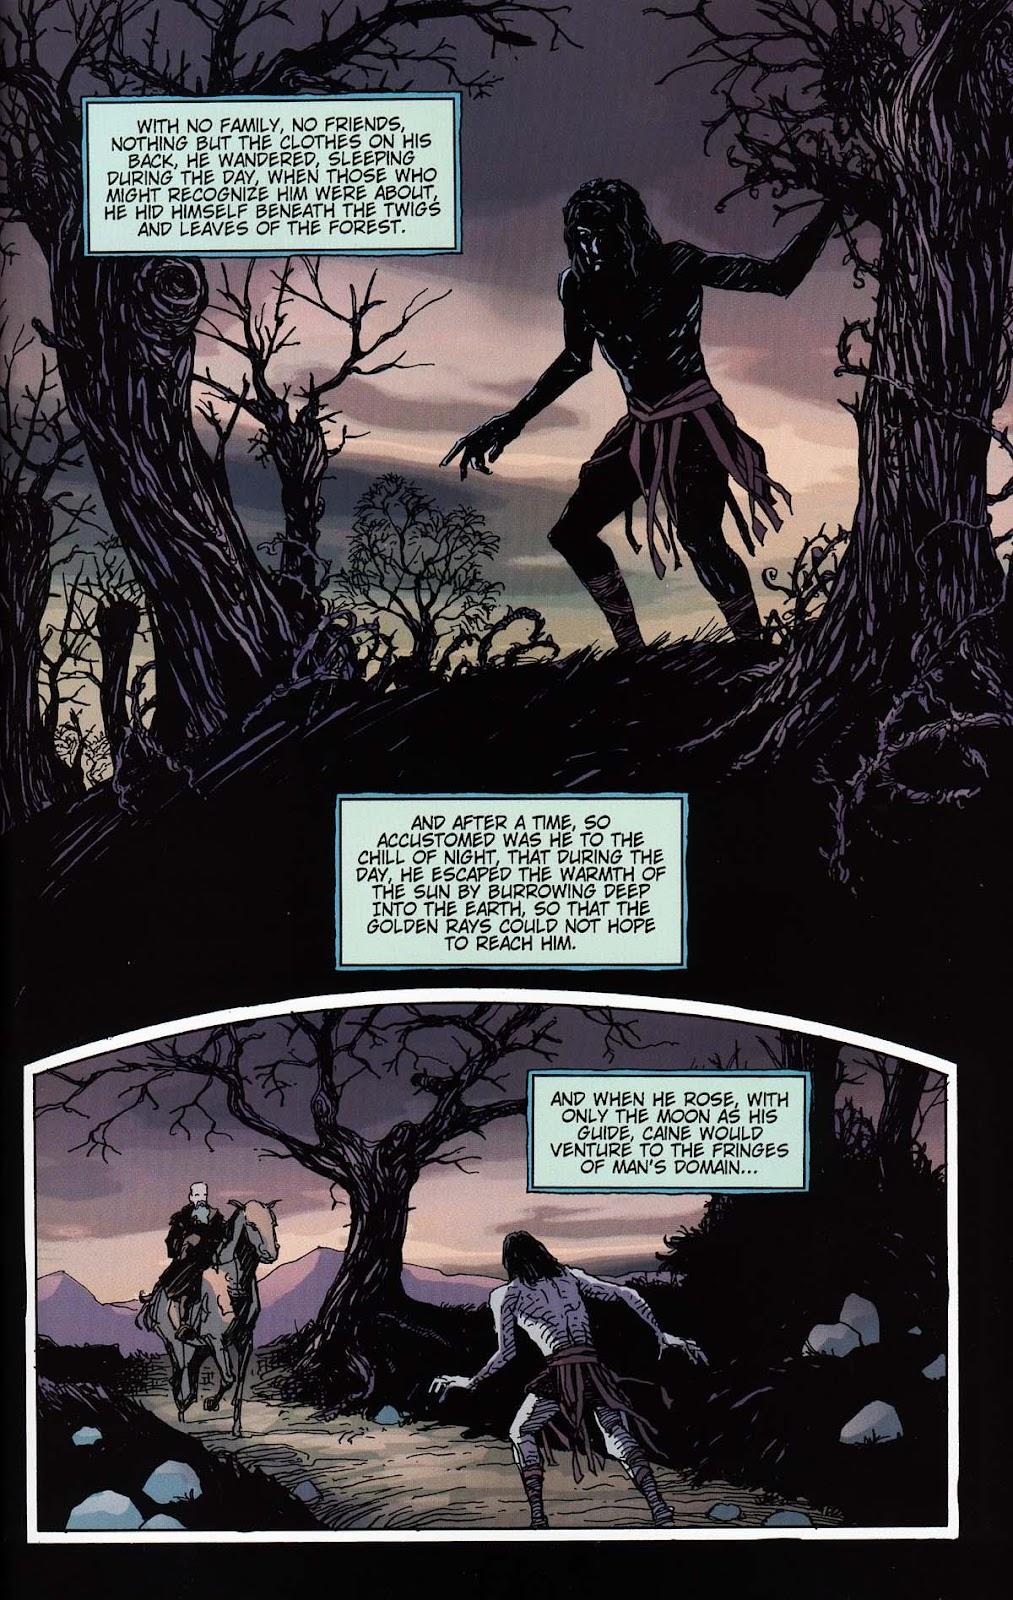 Read online Vampire the Masquerade comic -  Issue # Toreador - 25